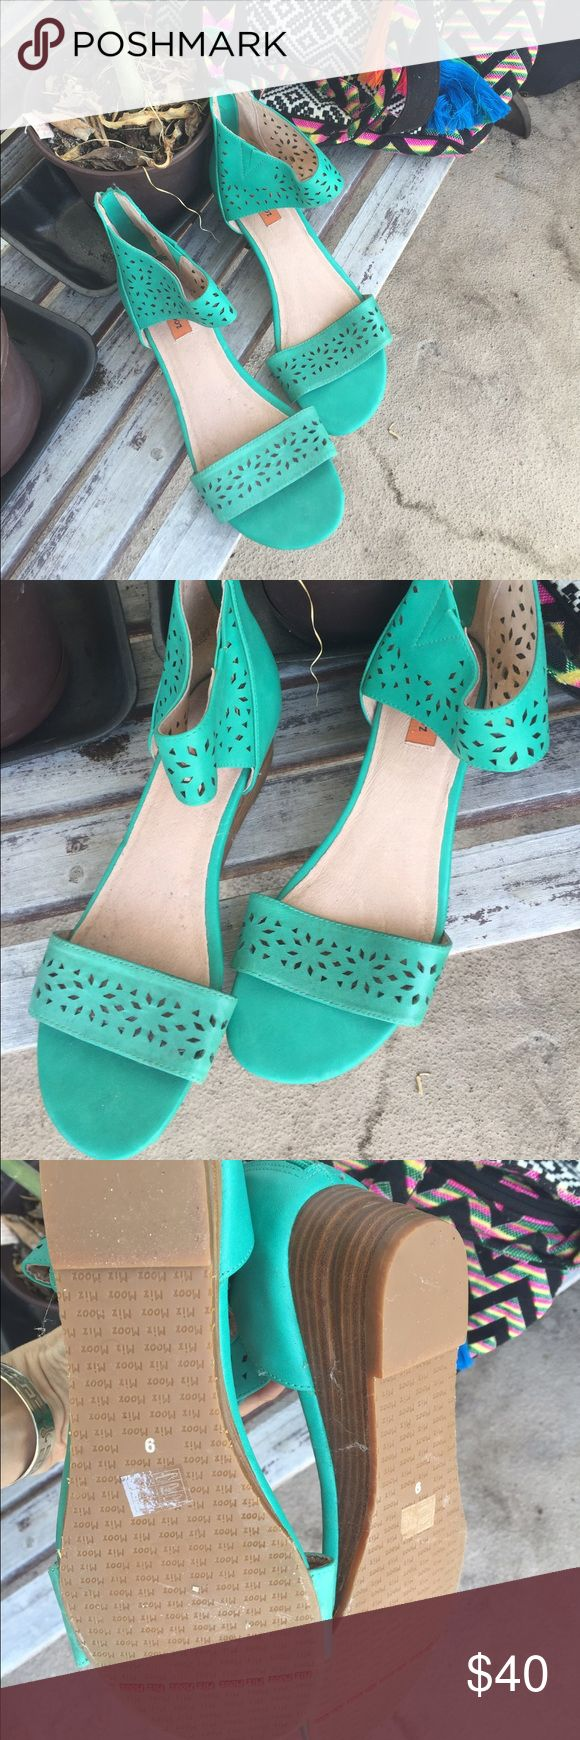 Miz Mooz gorgeous turquoise sandals size 9 🌷 Miz Mooz pair of turquoise sandals ... Genuine leather and never worn. Spring  leftovers !! Take advantage of the price! 🌷🌷🌷 Miz Mooz Shoes Sandals